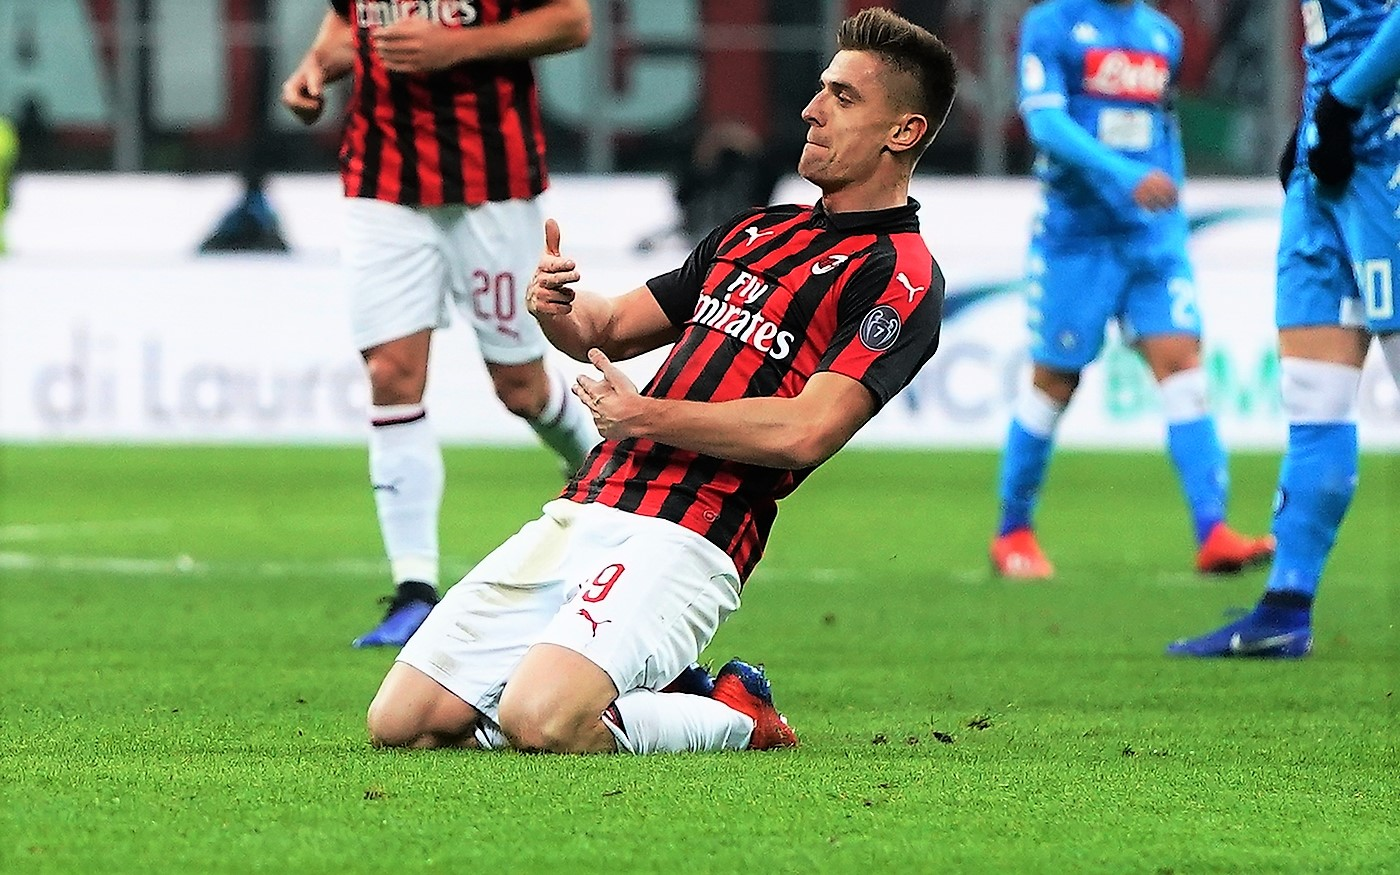 Milan-Frosinone 2-0, rossoneri agganciano quarto posto